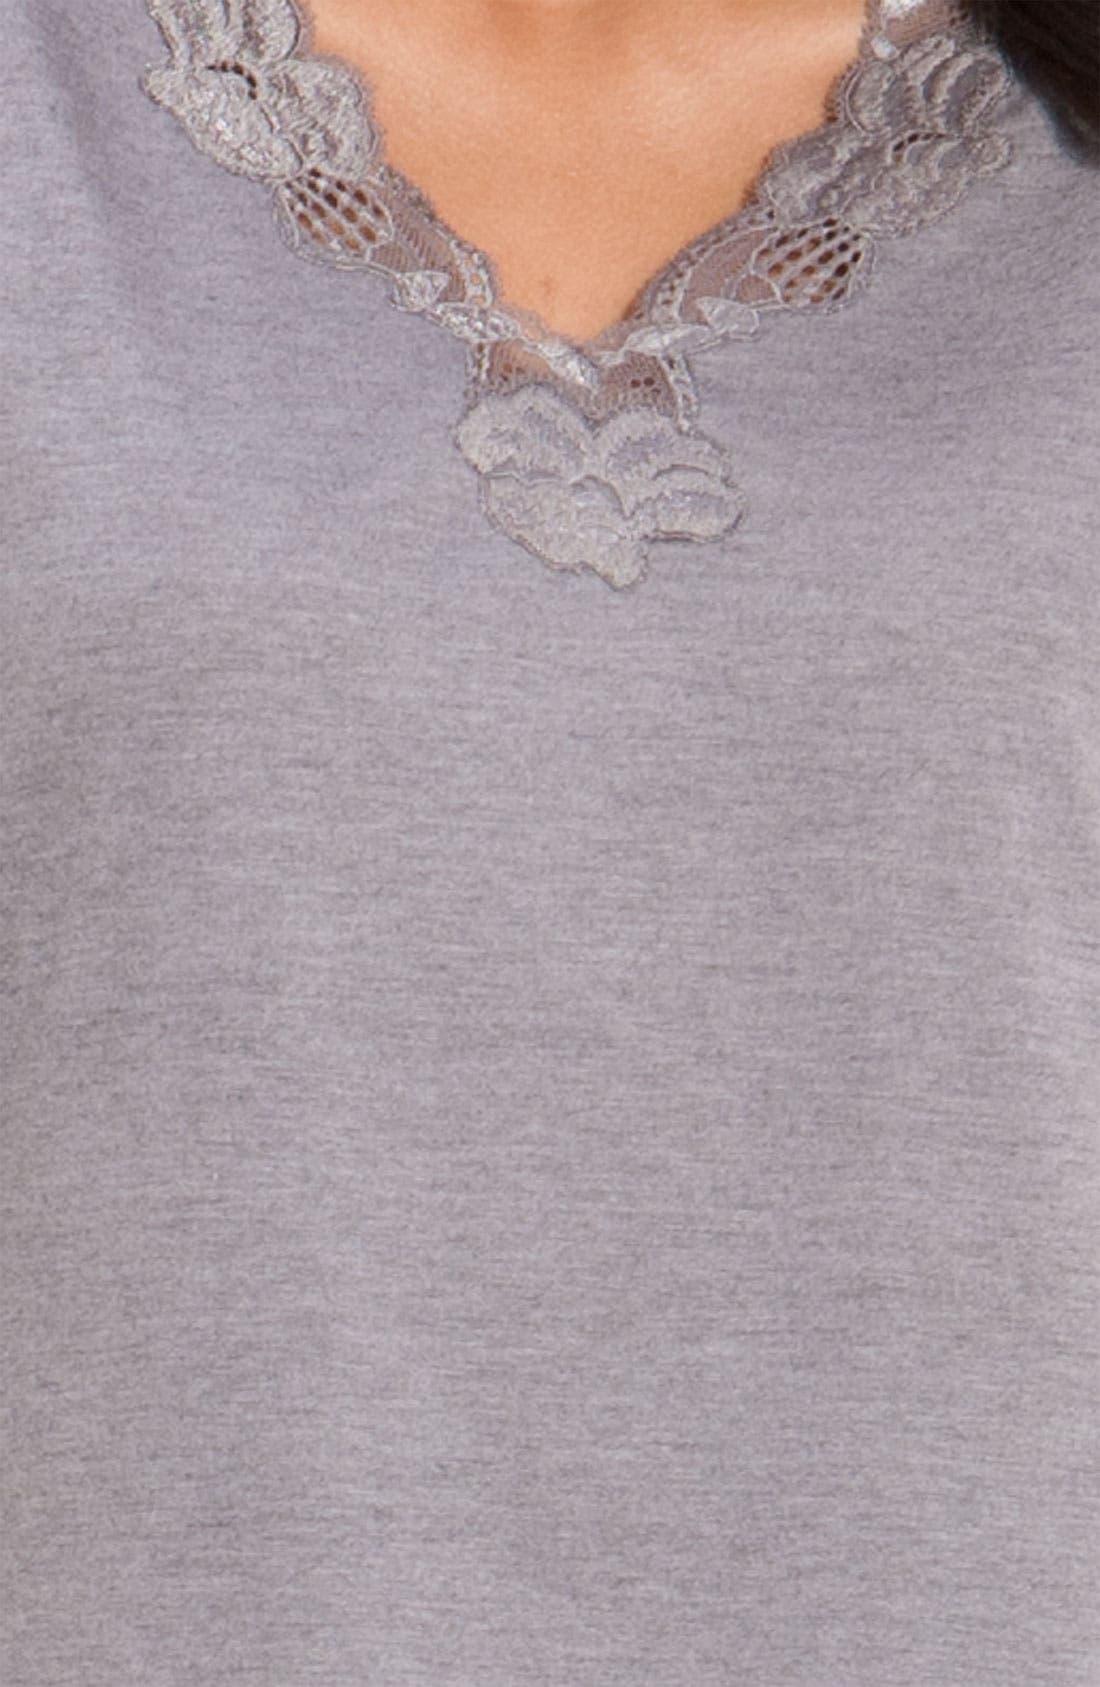 'Zen Floral' Pajamas,                             Alternate thumbnail 3, color,                             PASTEL GREY